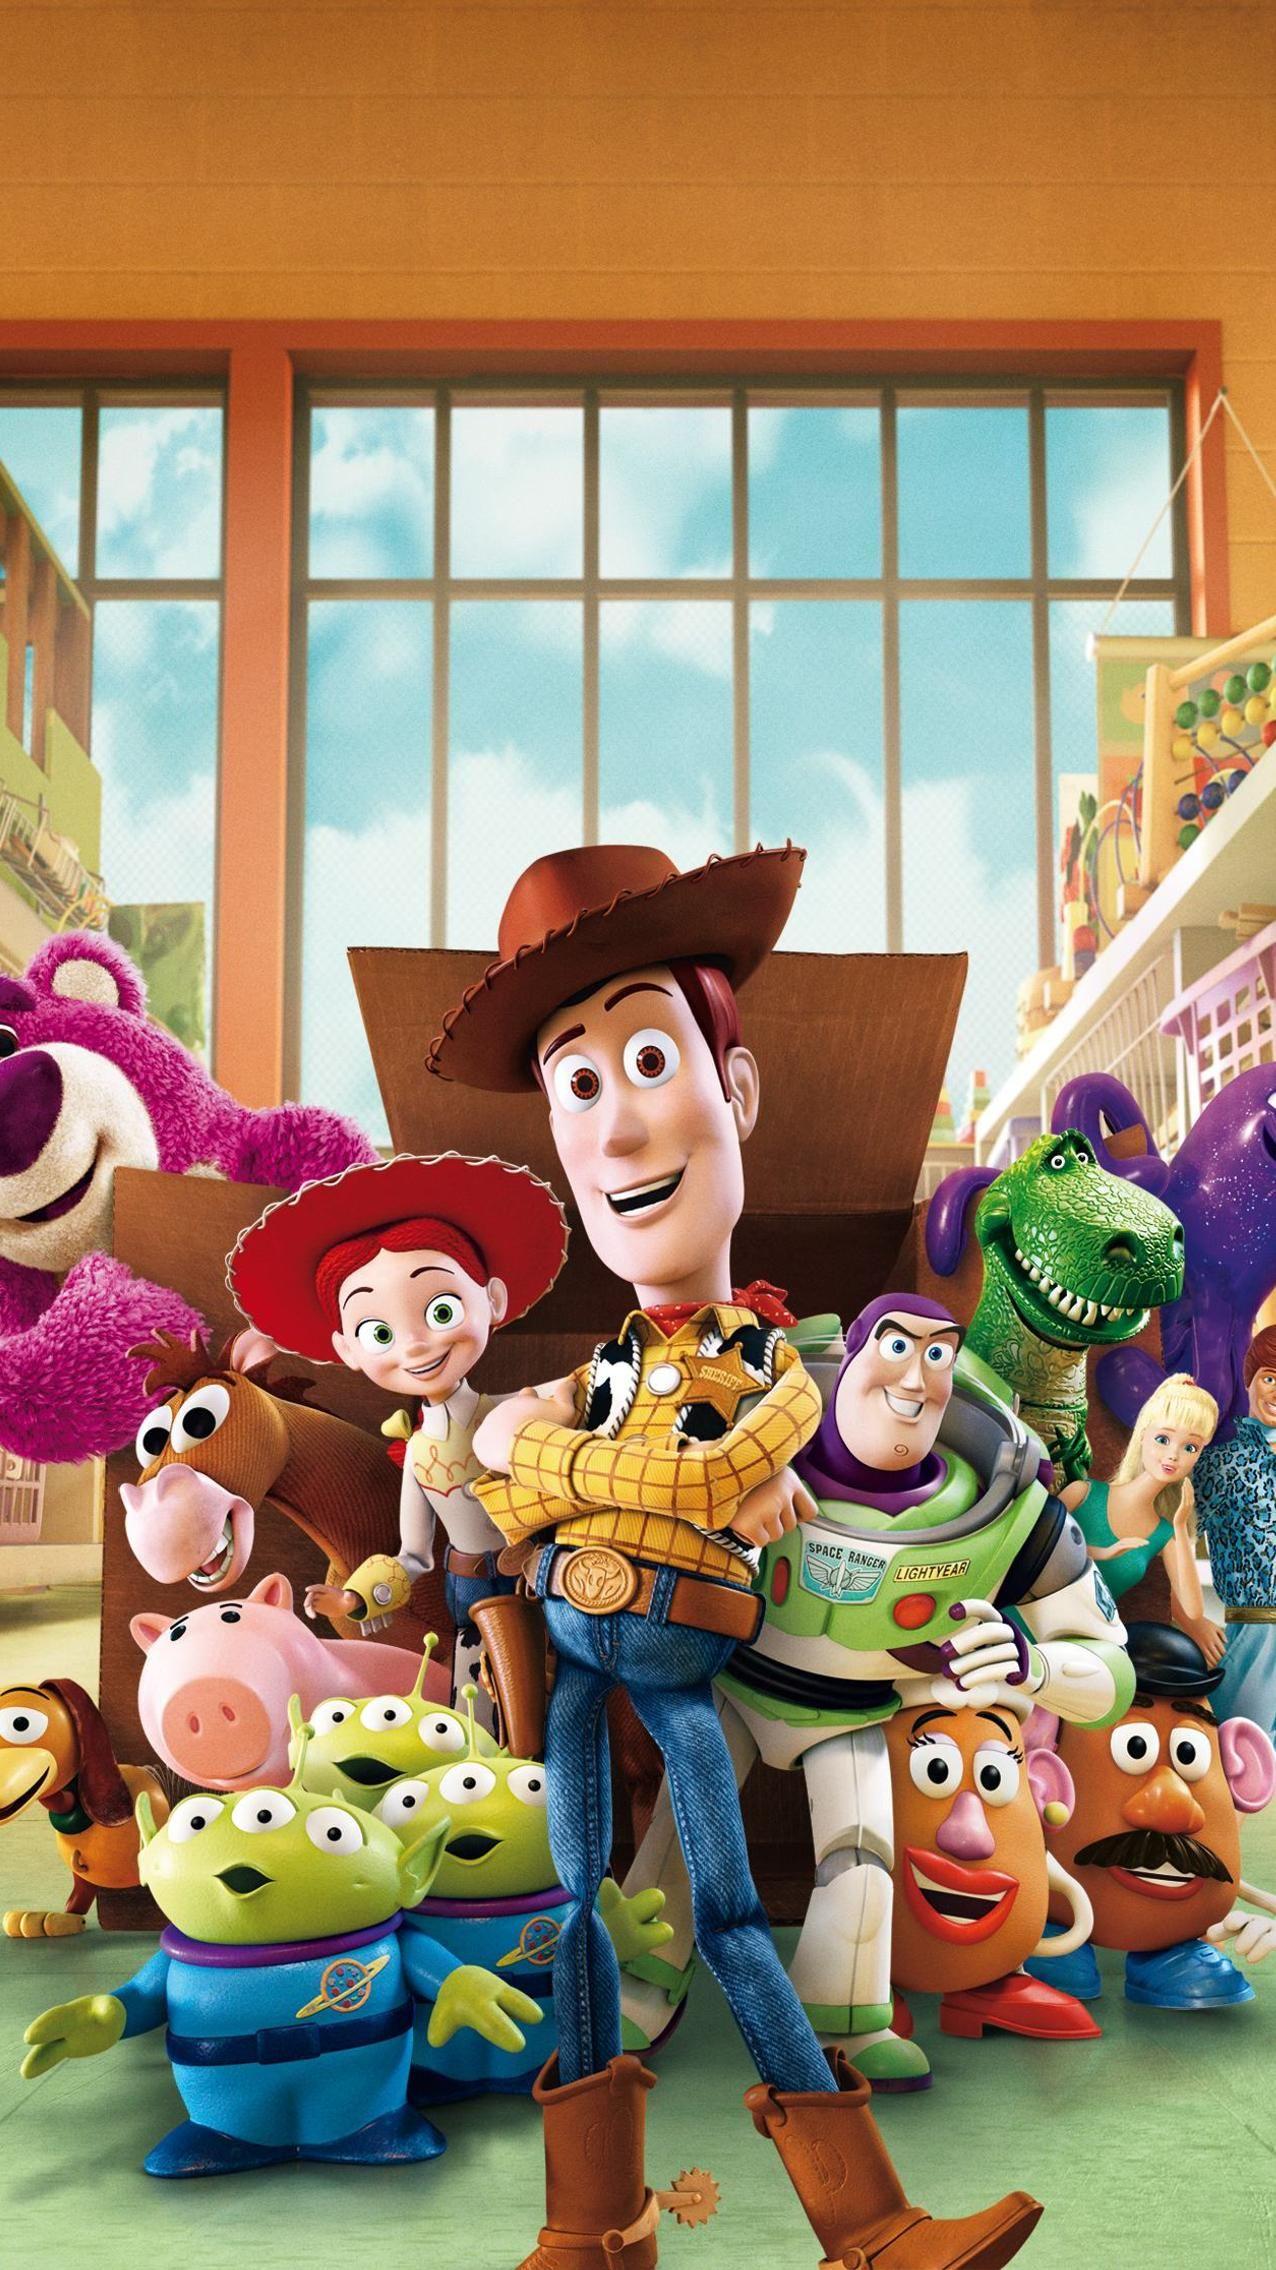 Toy Story 3 (2010) Phone Wallpaper en 2020 Fondos de